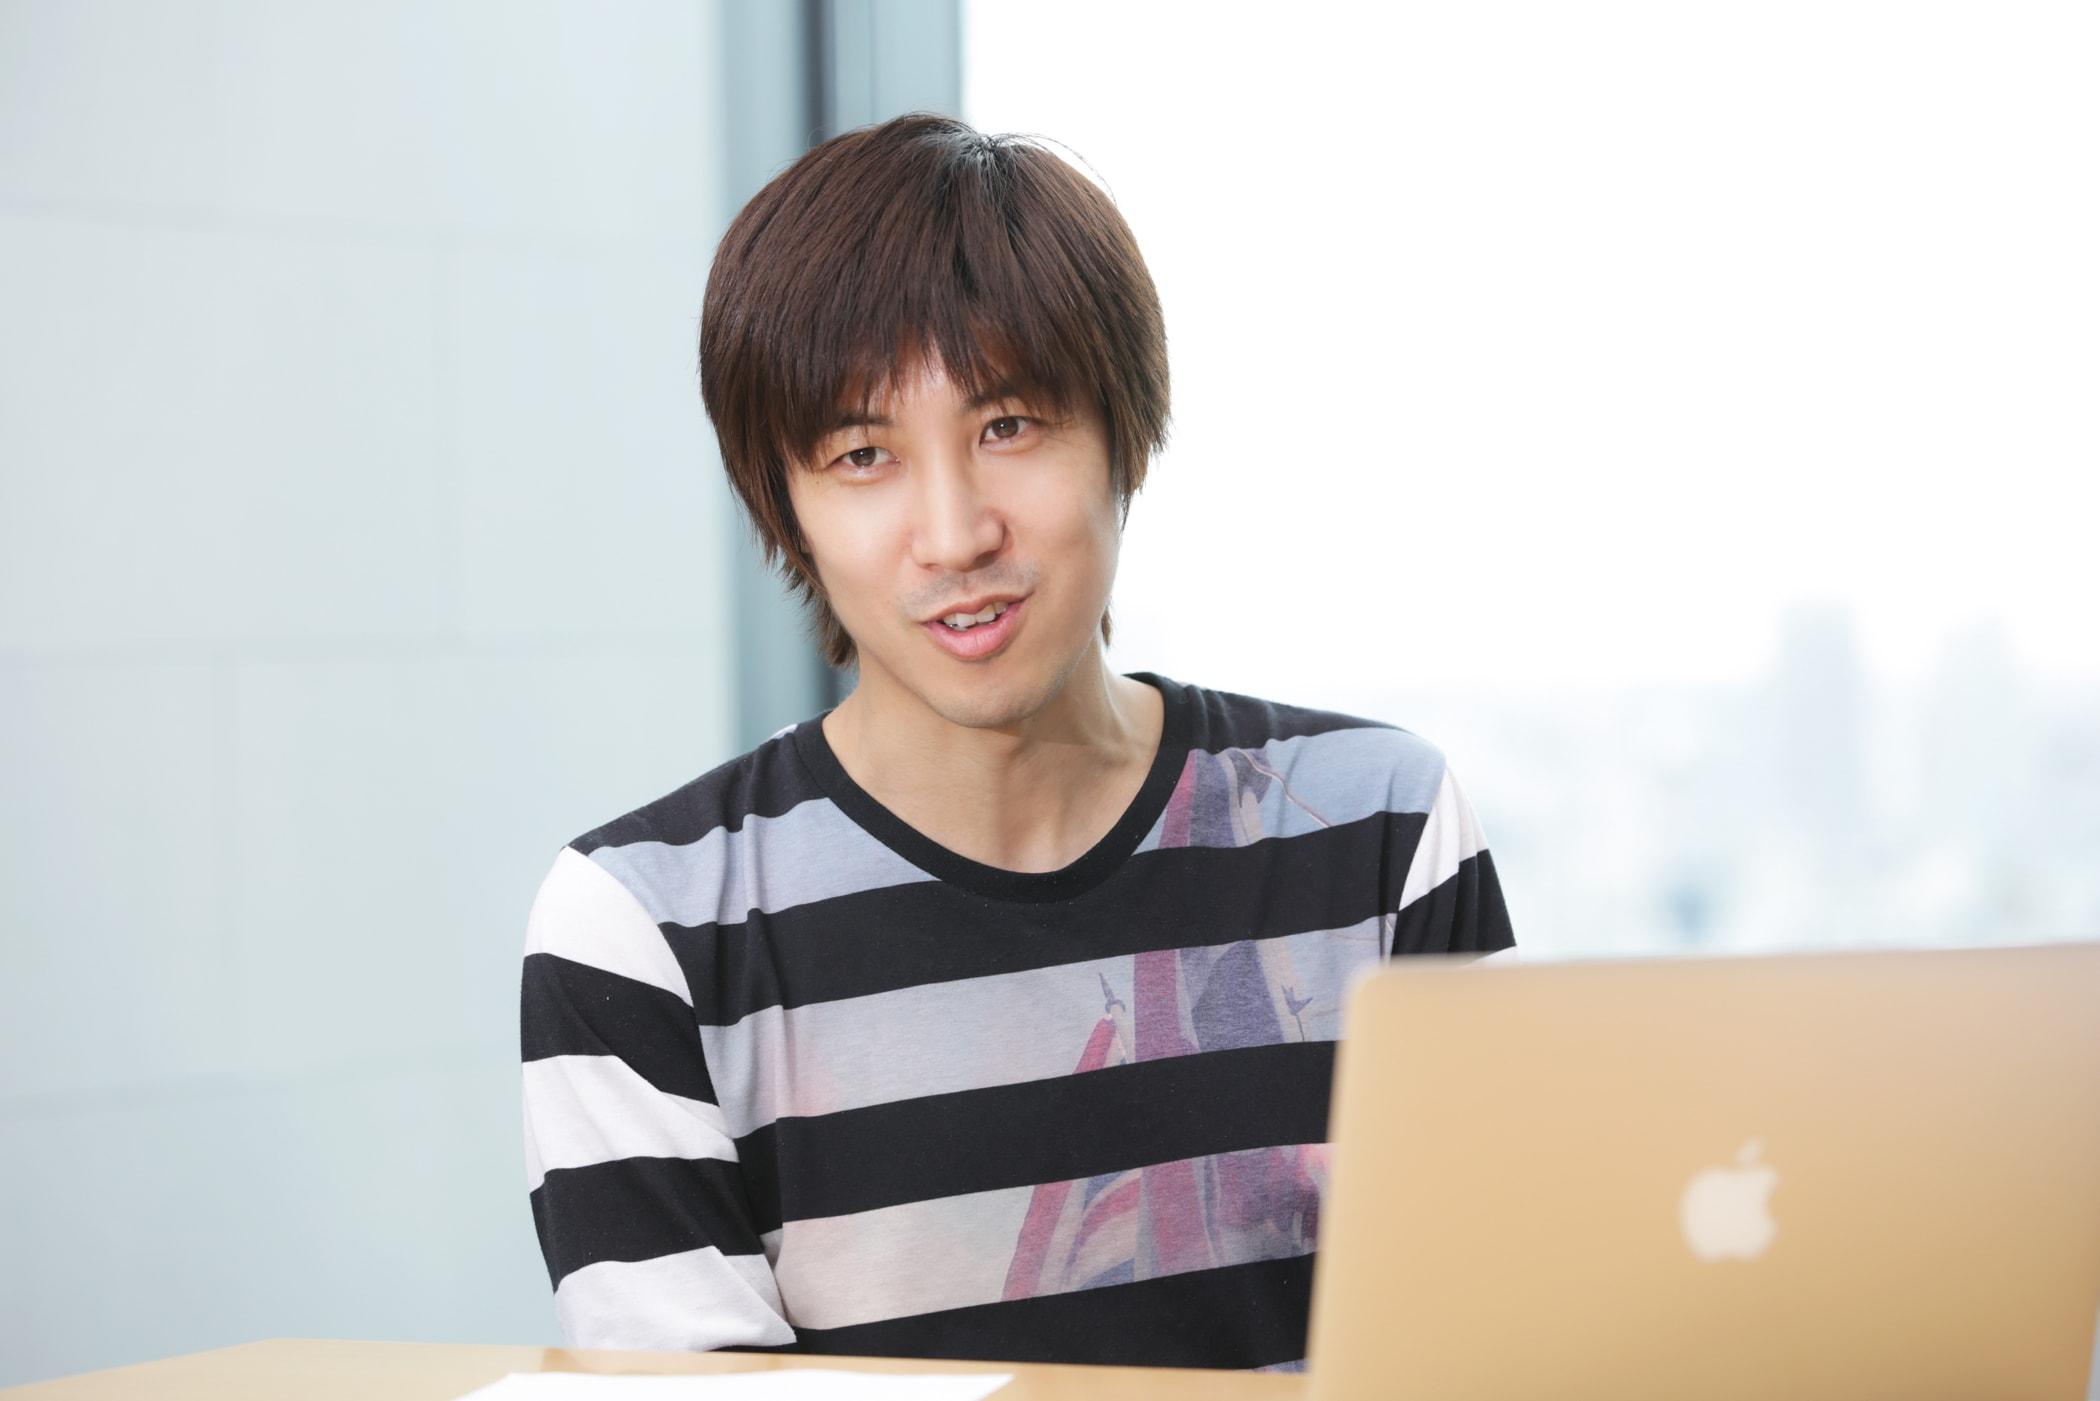 Mr. Kazufumi Mori, Manager / Leader, Livedoor News Team, 2nd Media Division, LINE Portal Company